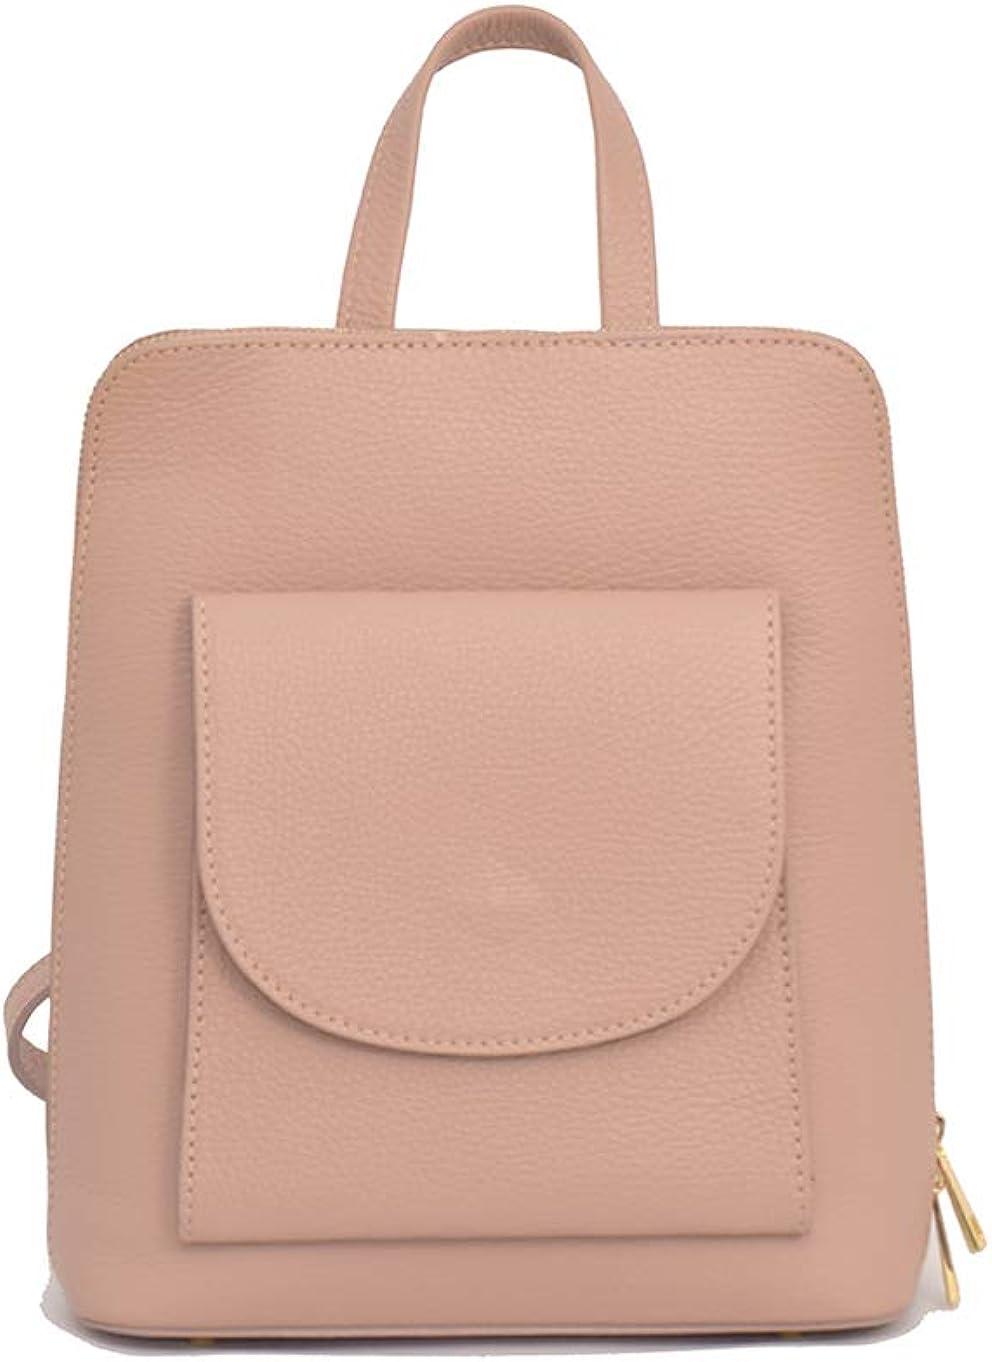 A to Z Leather Mochila 3 en 1 Backpack/Mochila bandolera o mochila cruzada. Auténtico cuero italiano. Rosa